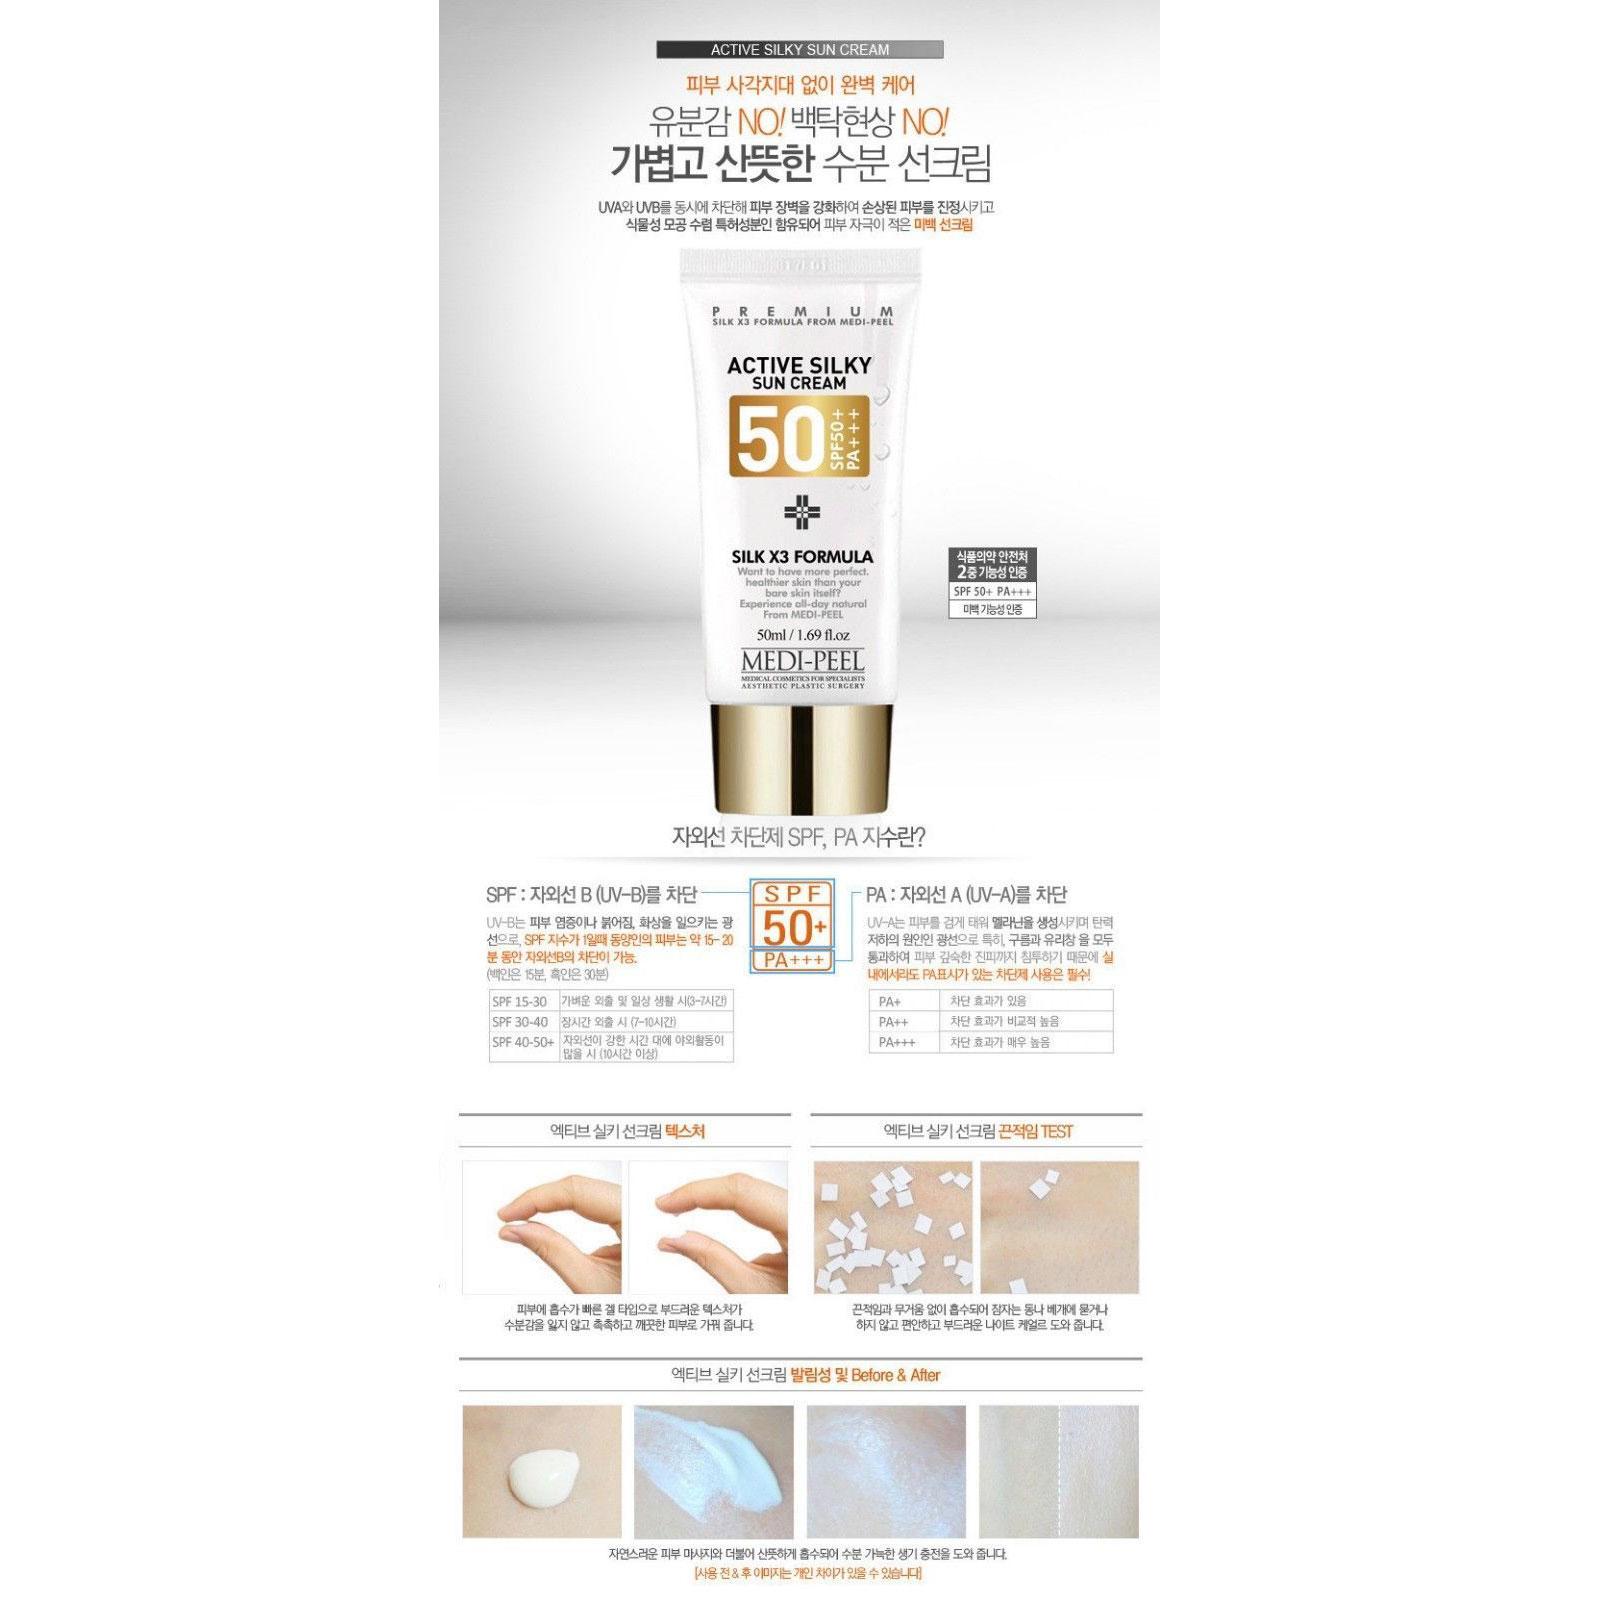 MEDI-PEEL Active Silky Sun Cream SPF50 PA+++